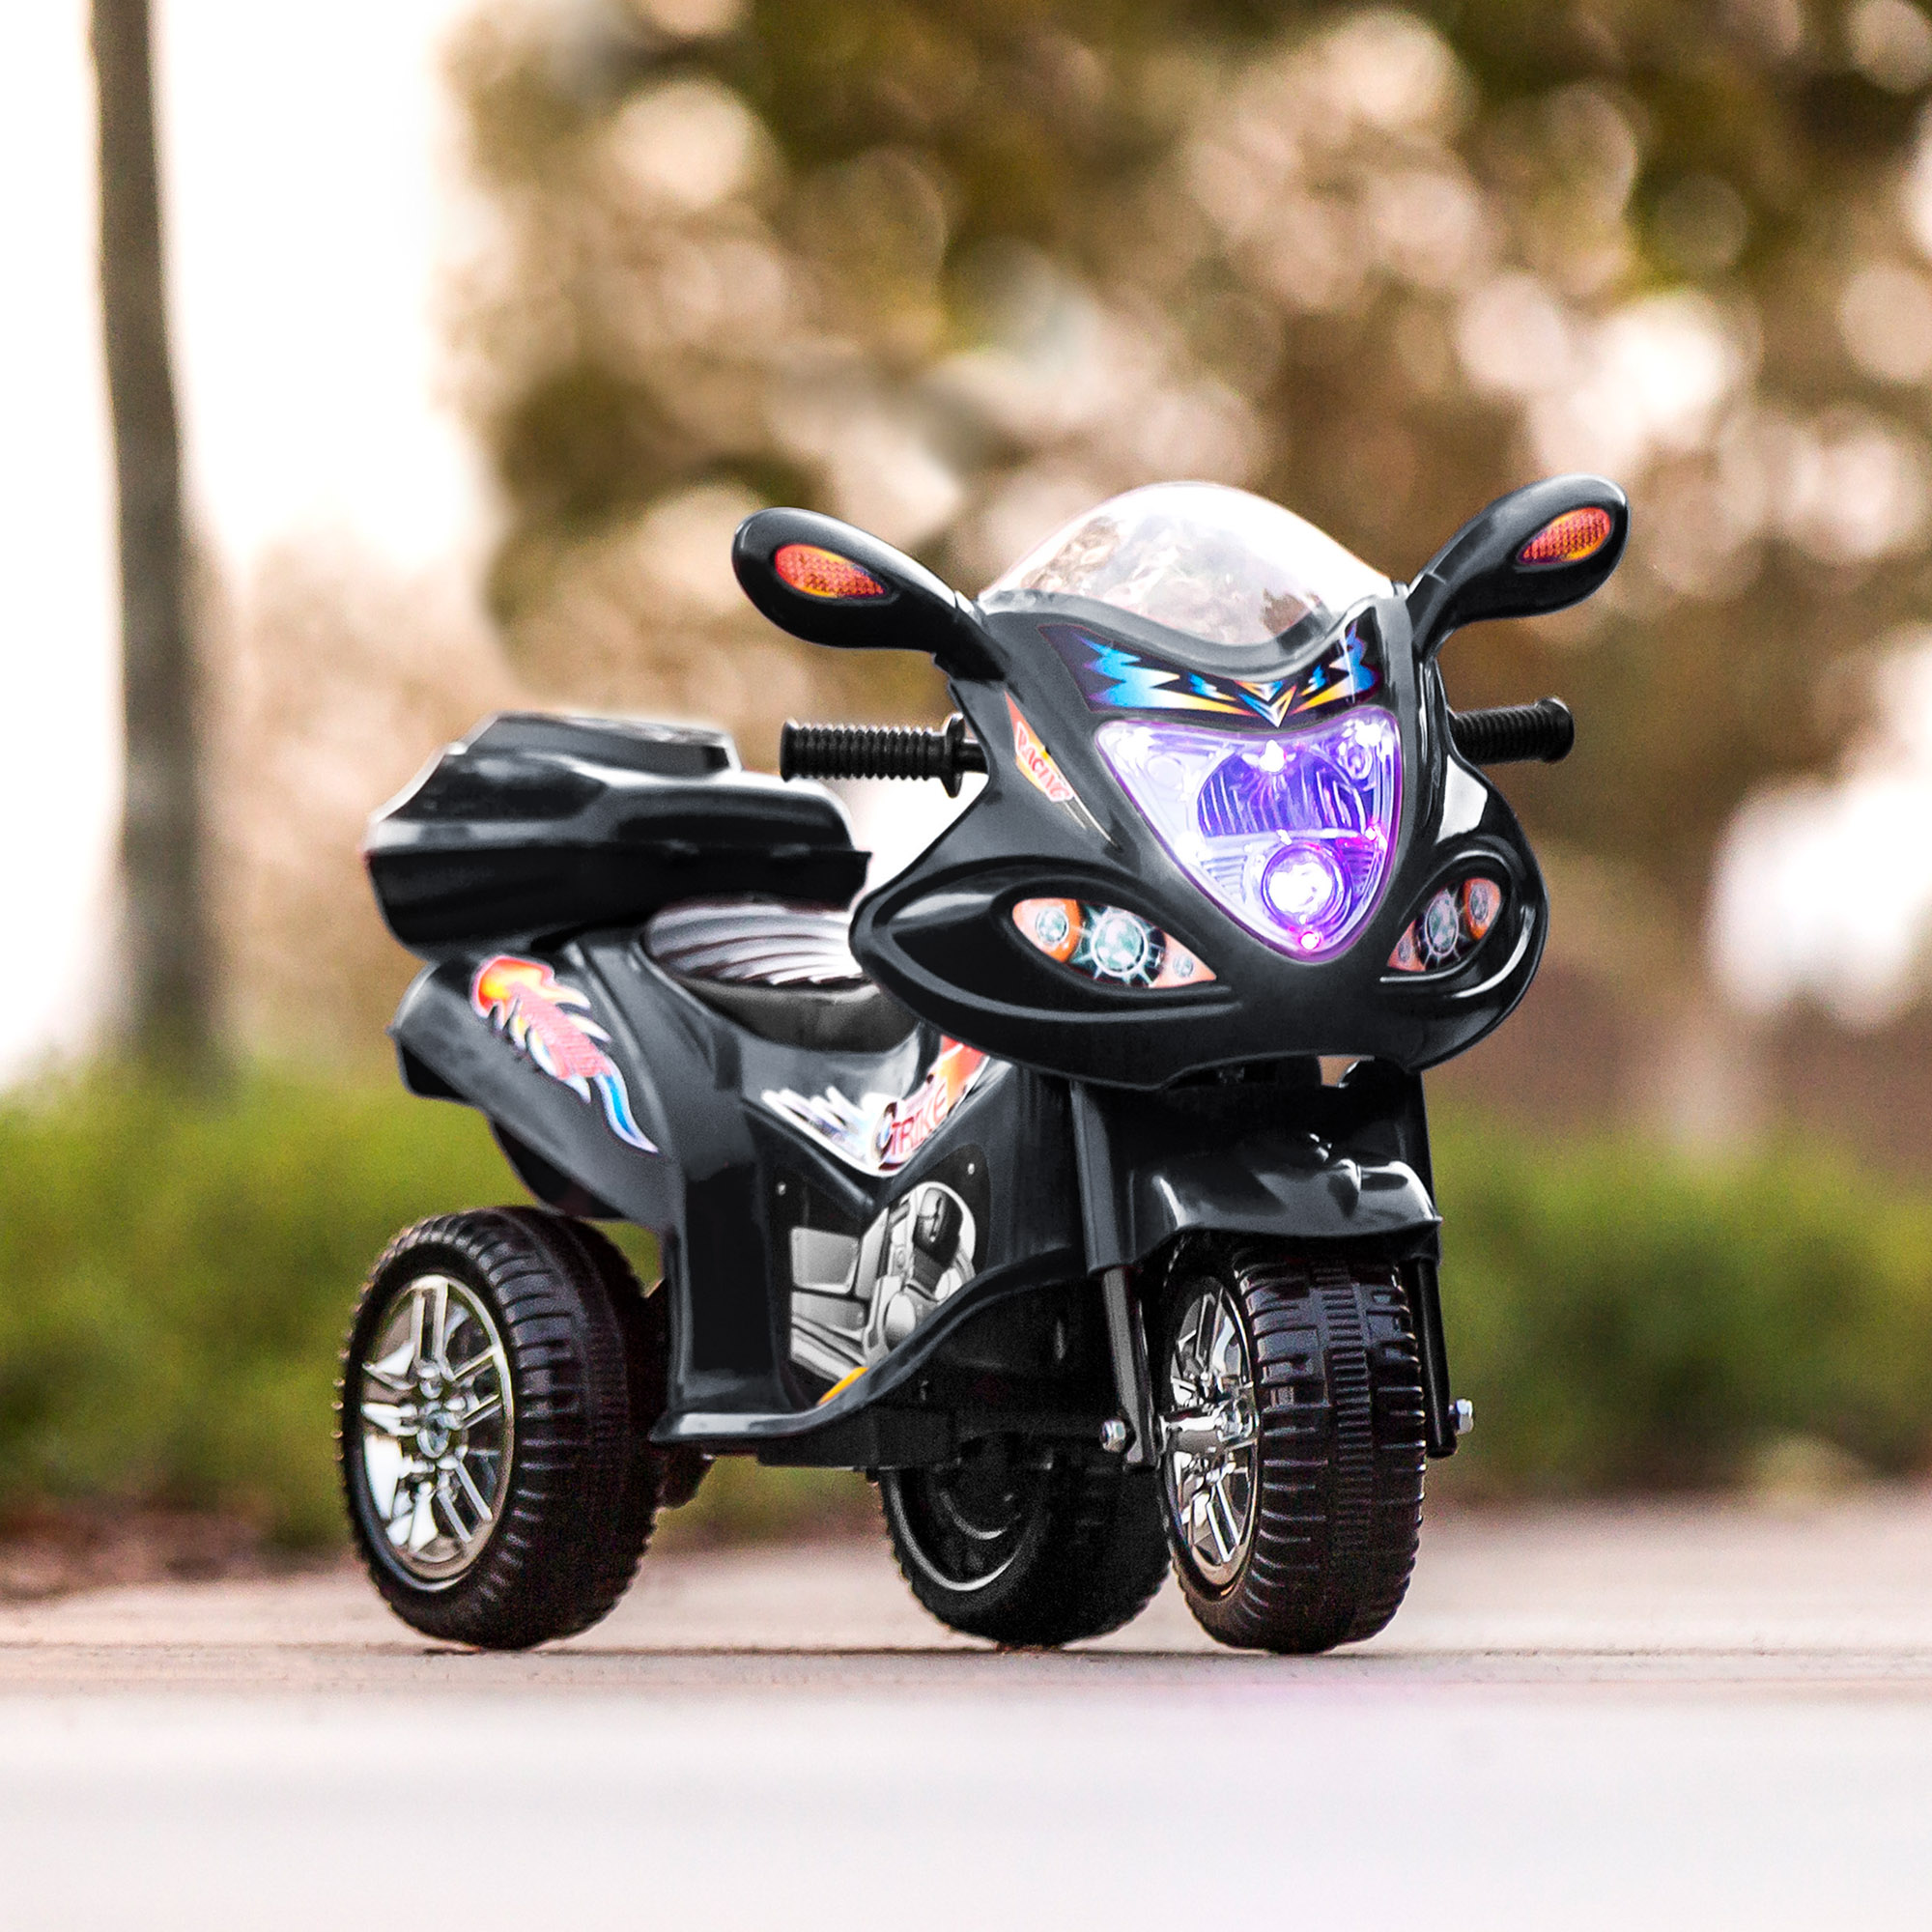 BCP-6V-Kids-3-Wheel-Motorcycle-Ride-On-Toy-w-LED-Lights-Music-Storage thumbnail 8